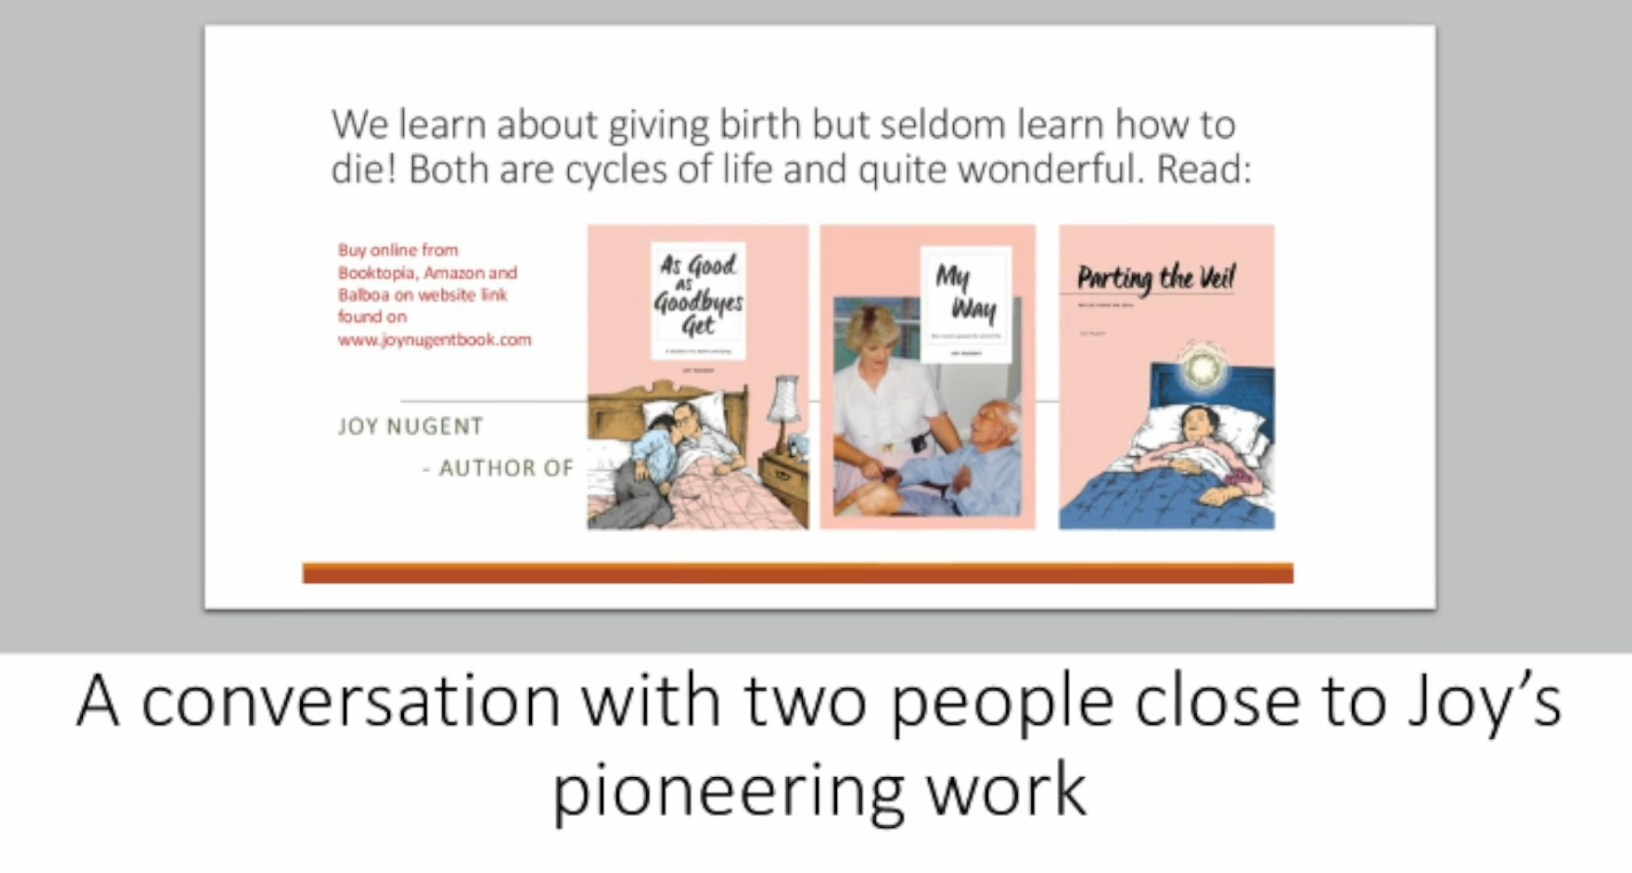 Energy Wisdom from Author Joy Nugent